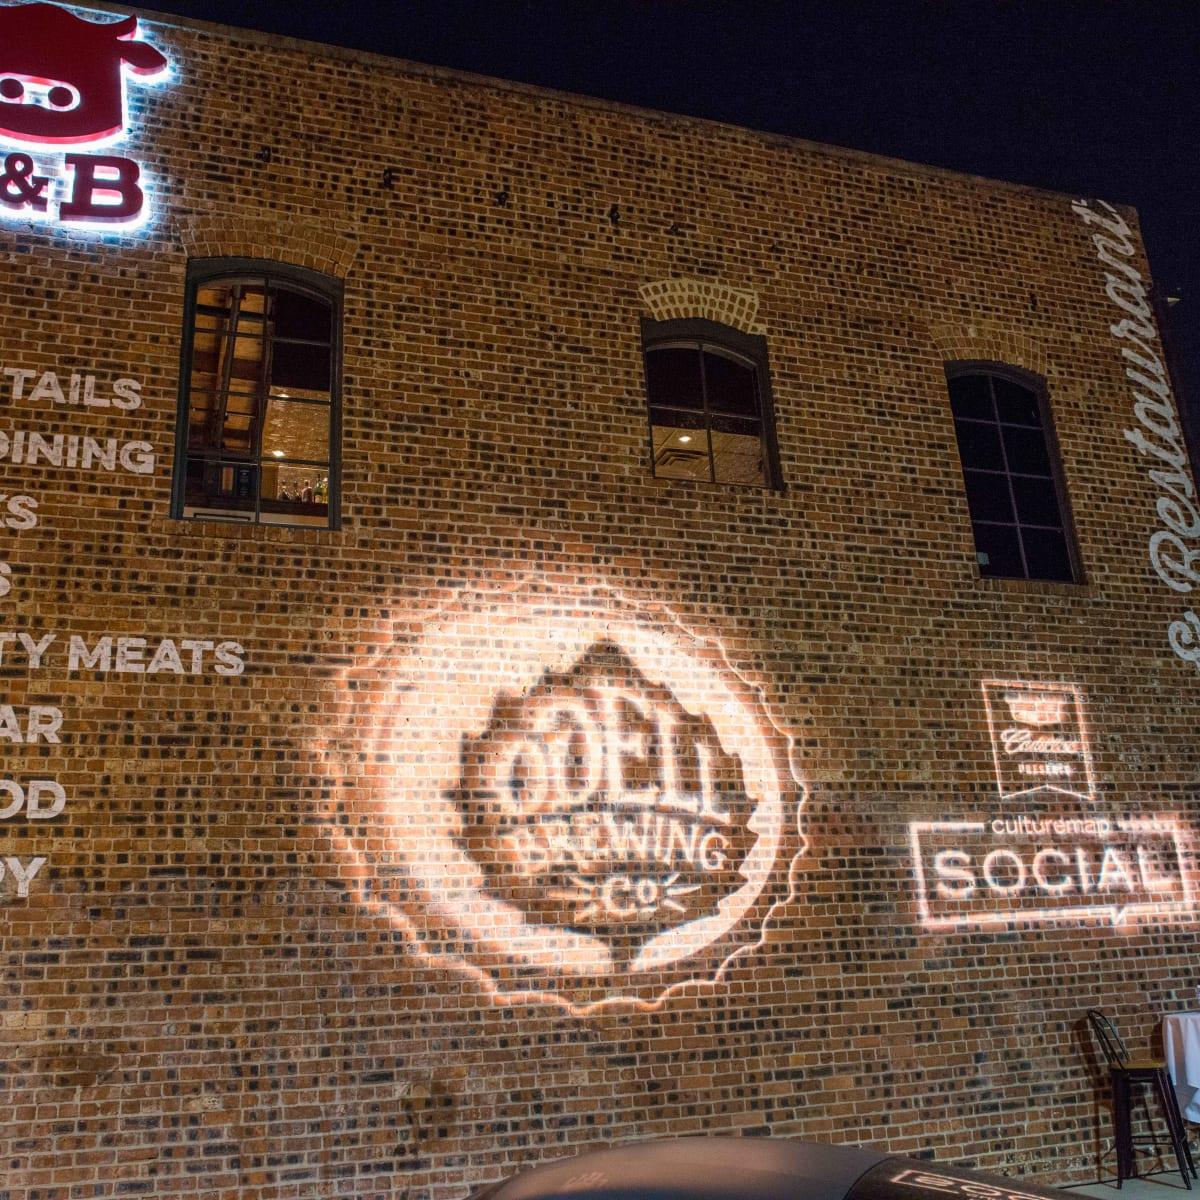 News, CultureMap Social, B&B Butchers, Sept. 2015 Sarah building